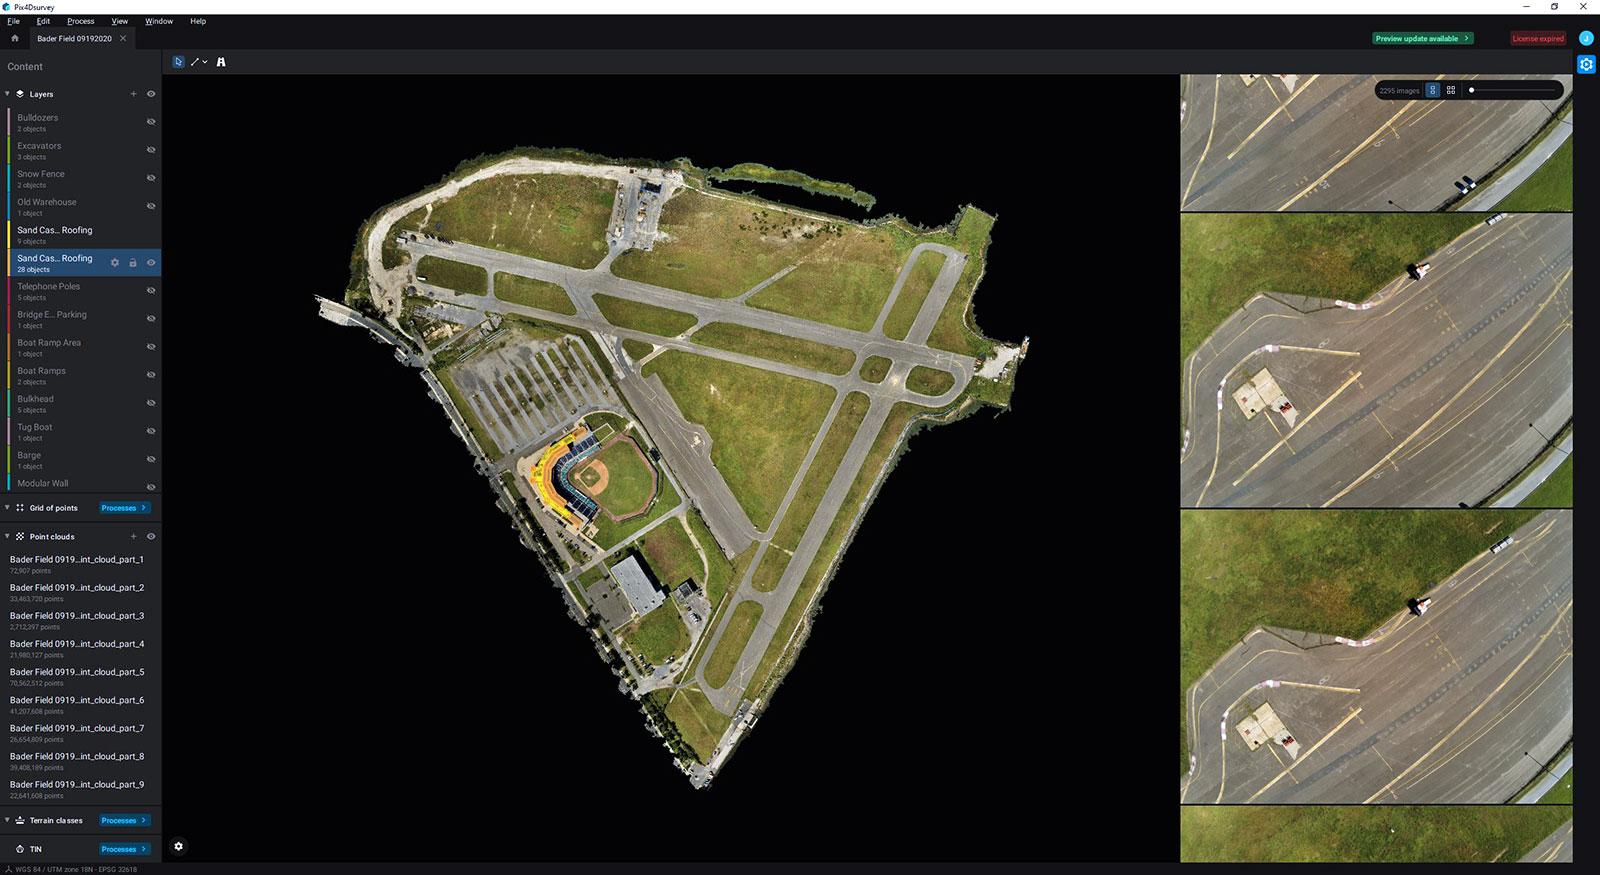 The airfield in Pix4Dsurvey's ijnterface